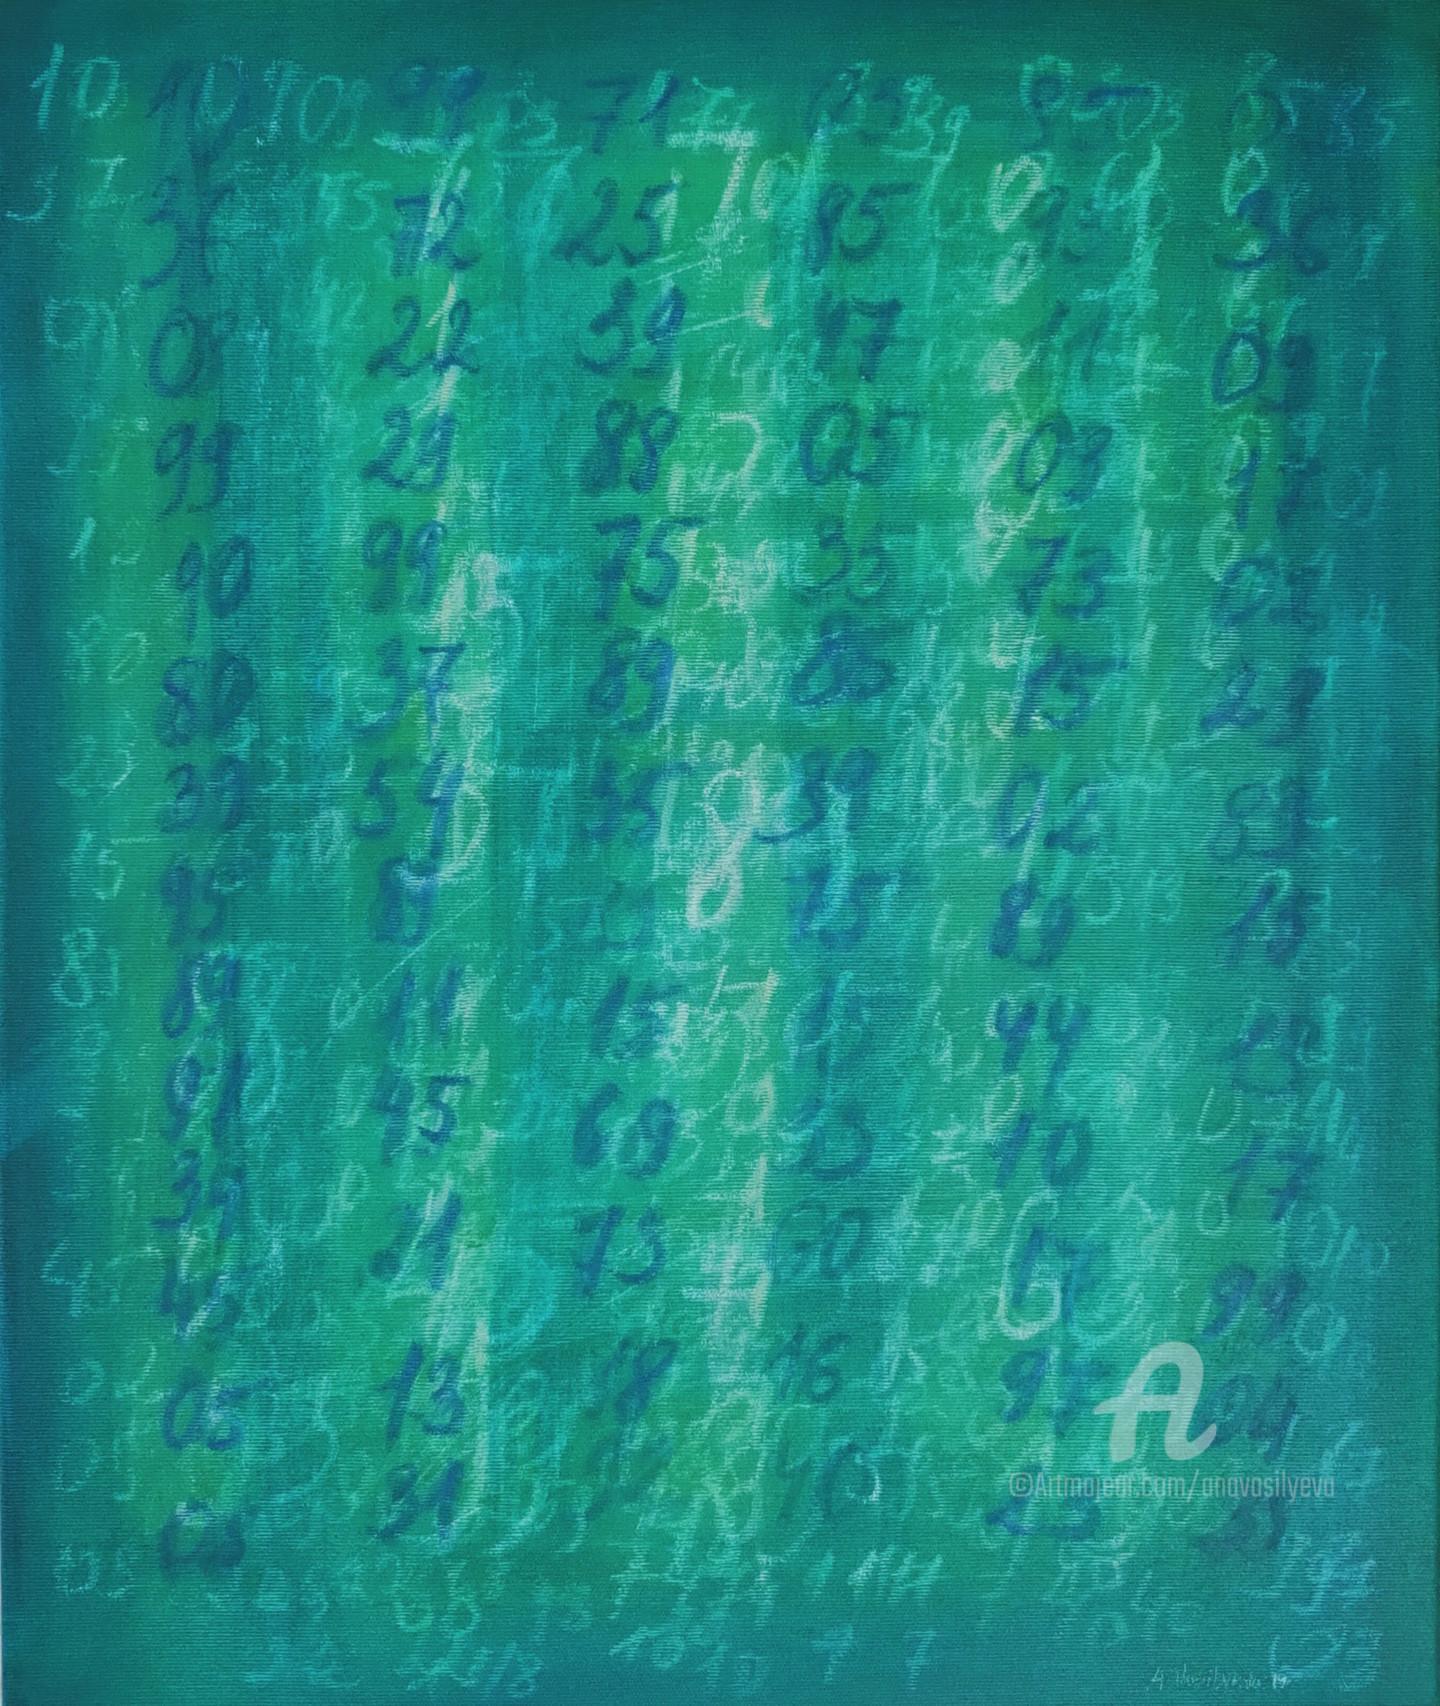 Anastasia Vasilyeva - Small green field with numbers